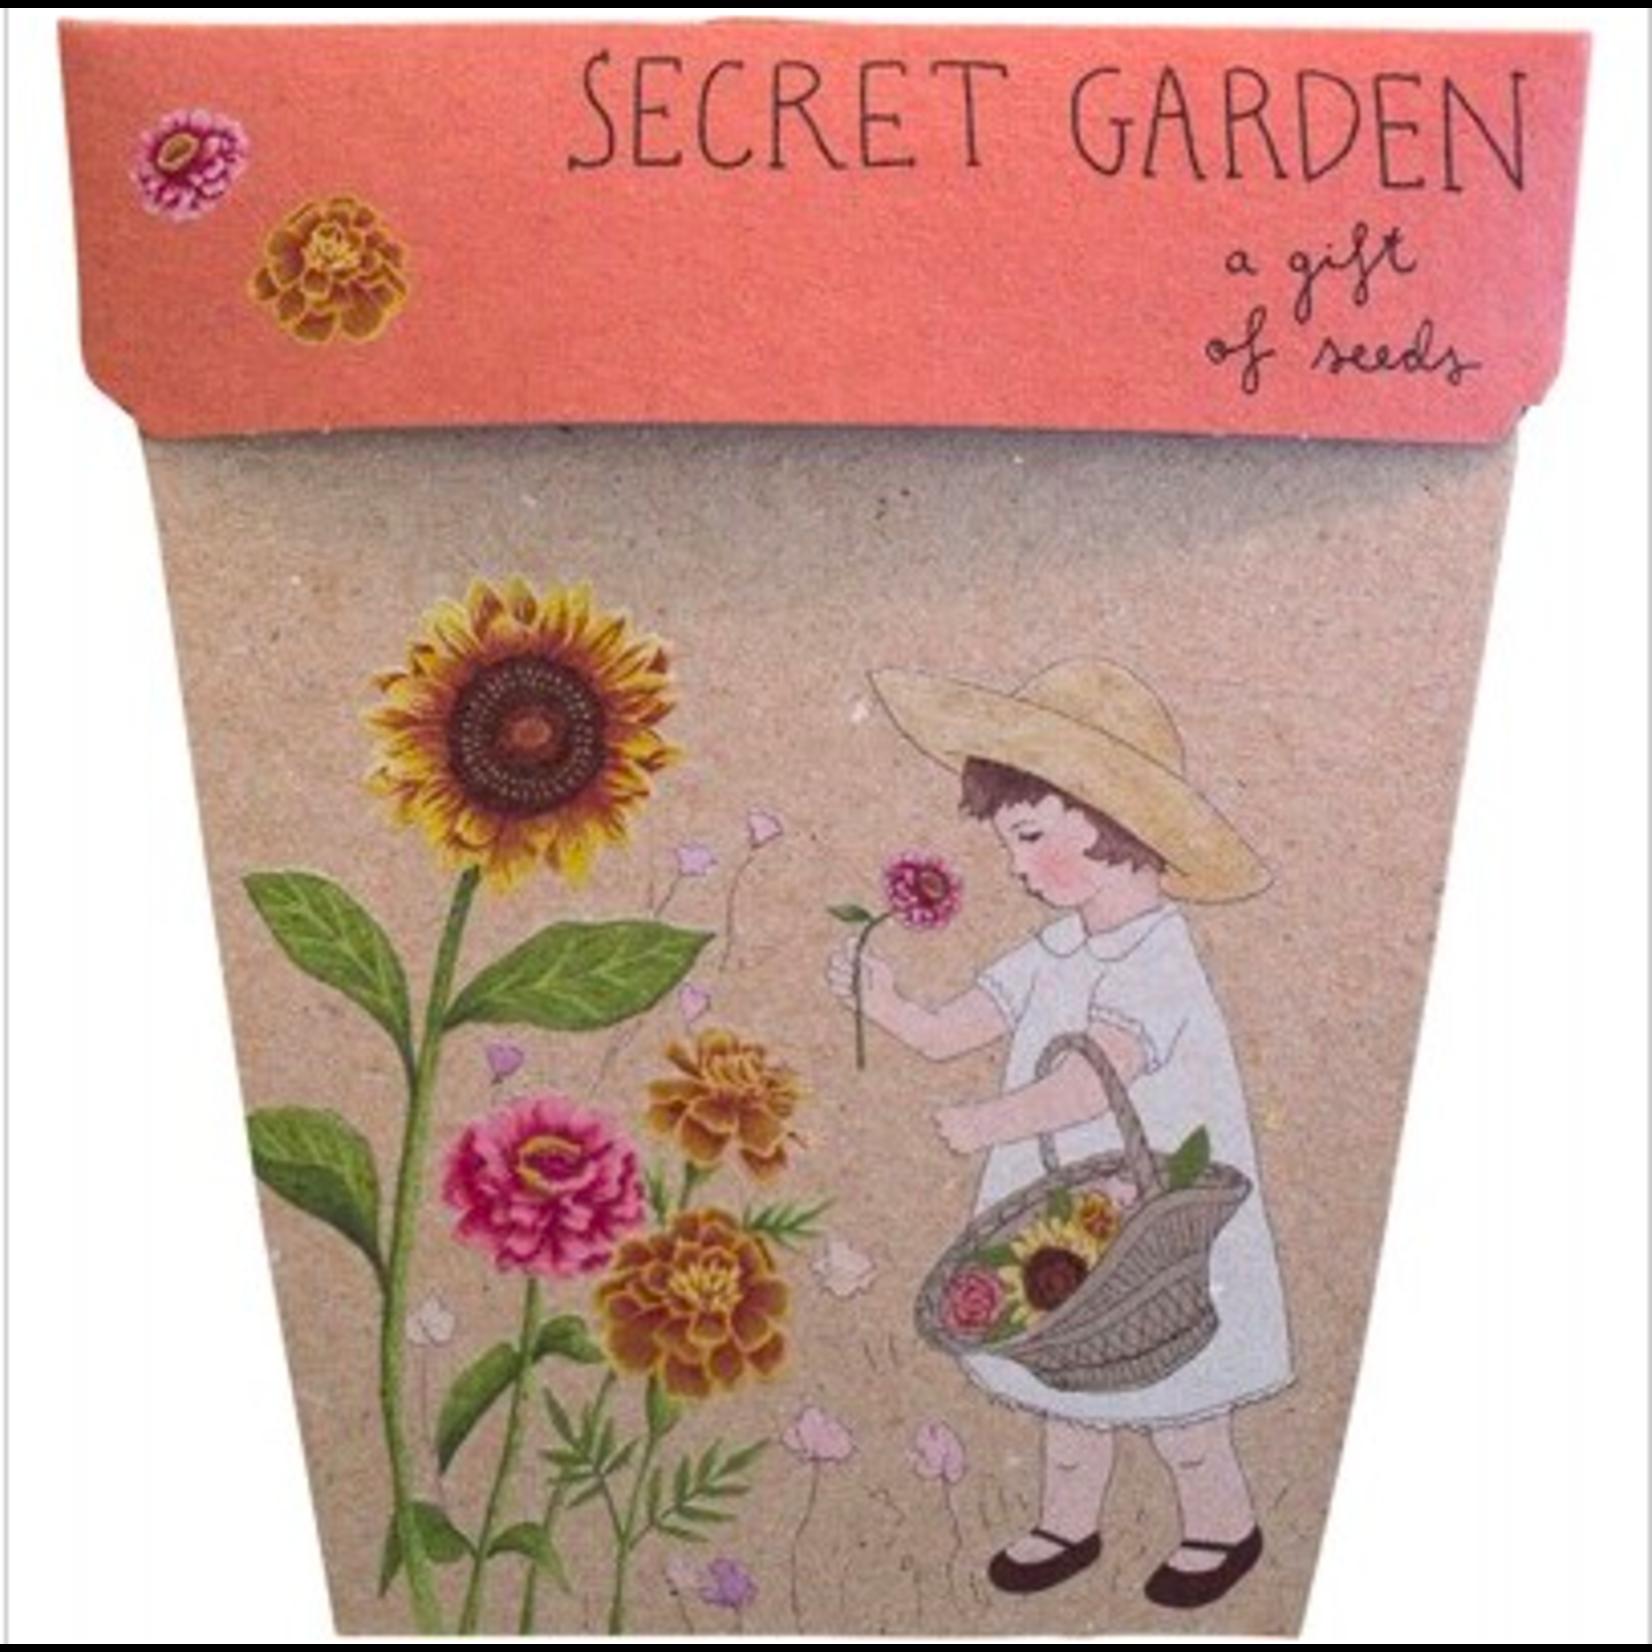 Sow 'n Sow Sow 'N Sow Gift of Seeds Secret Garden